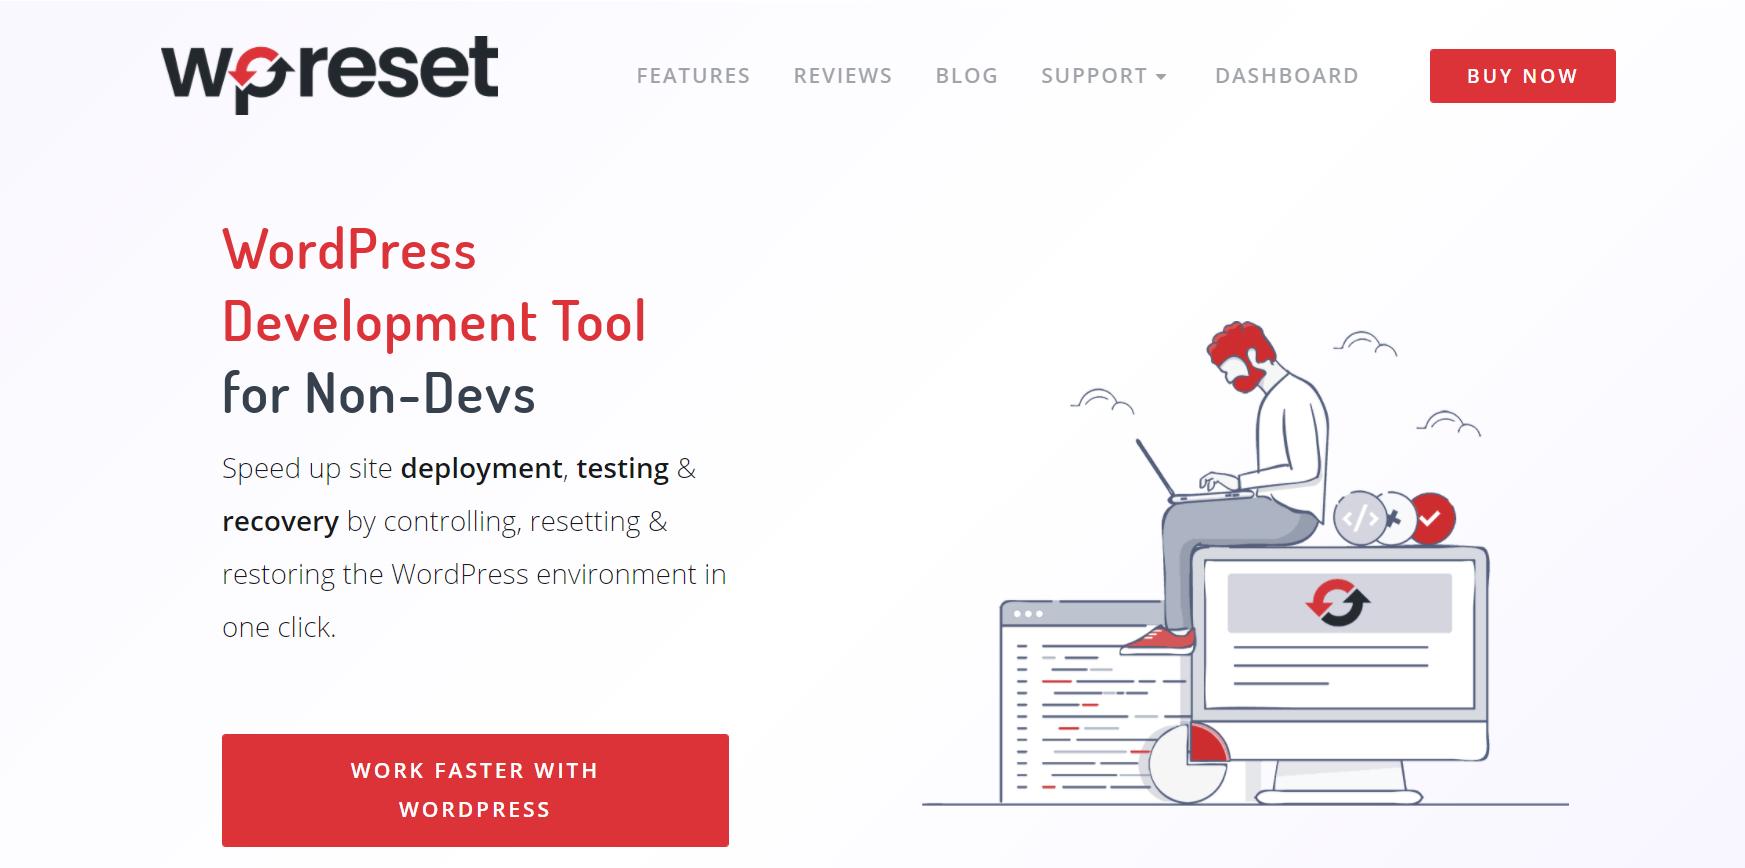 WP Reset homepage